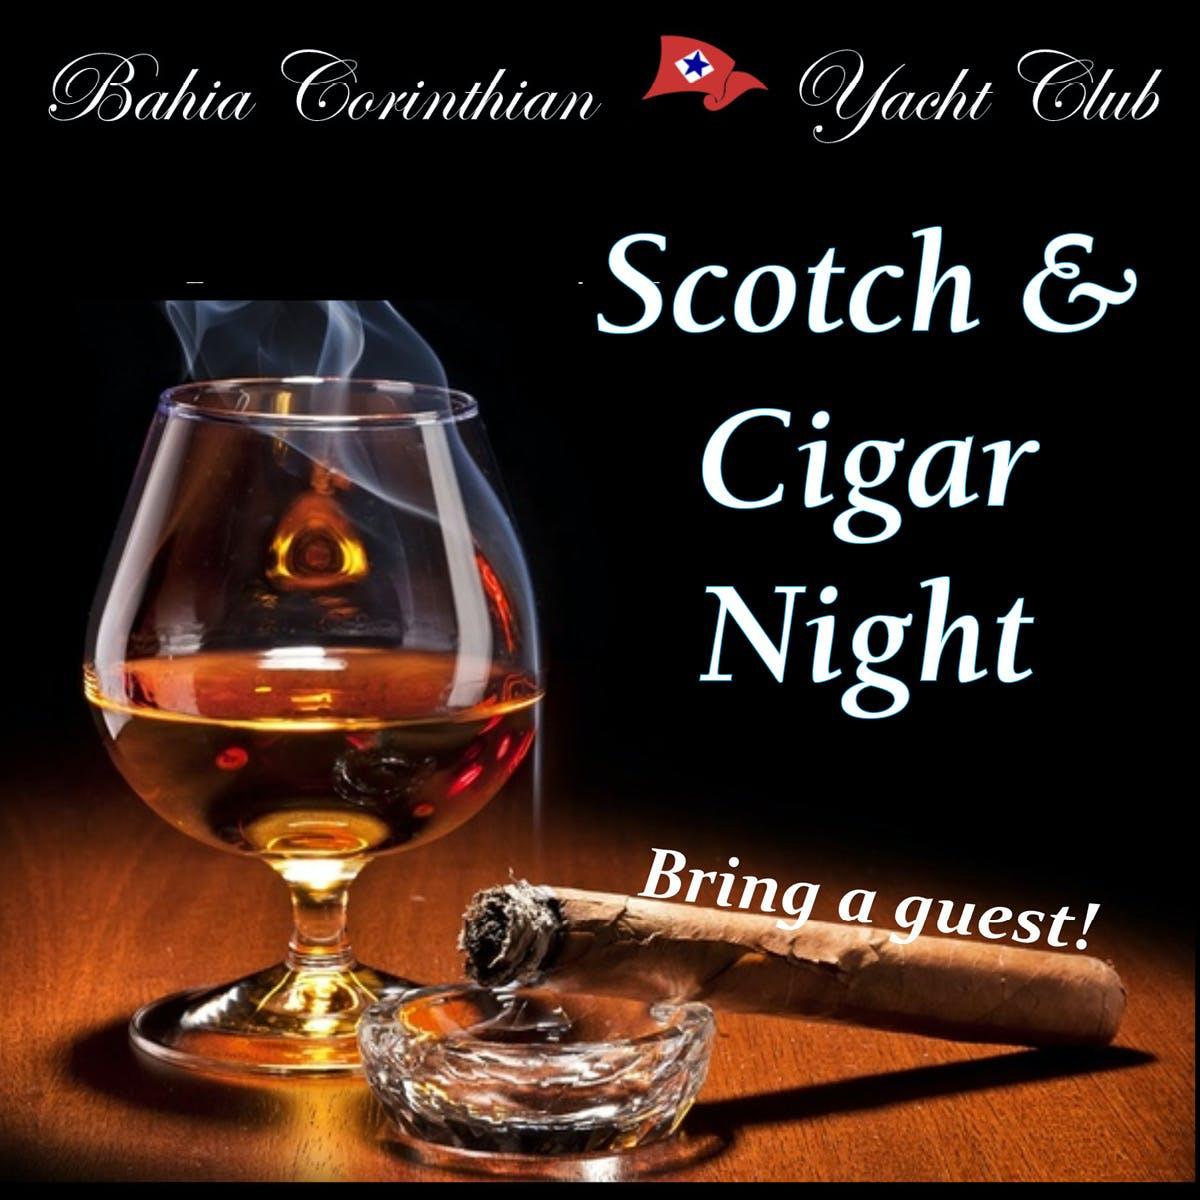 Scotch & Cigar Night